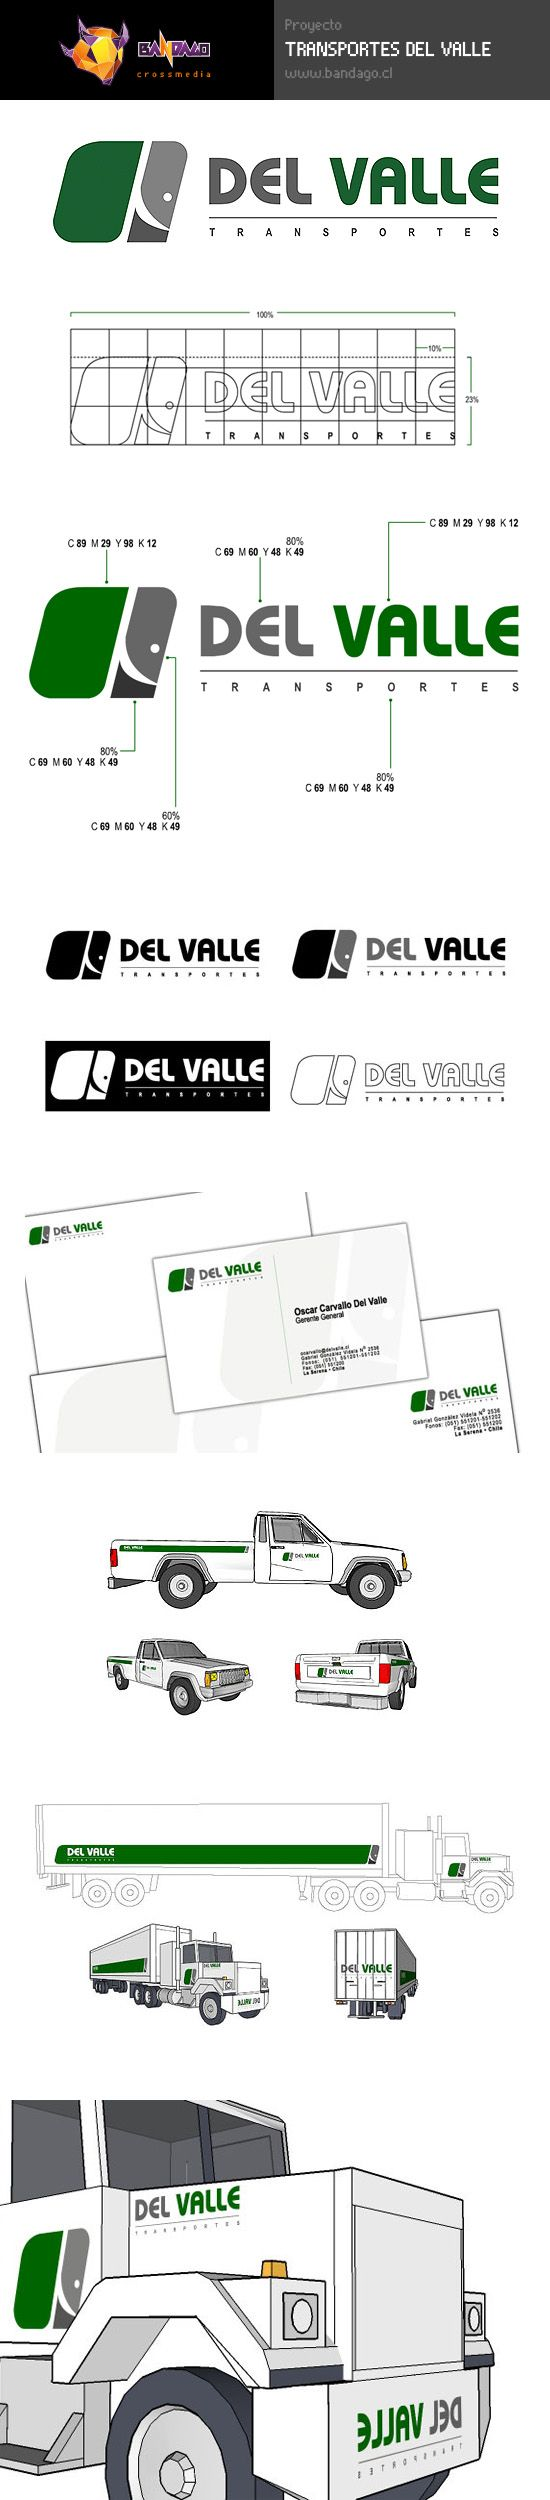 Diseño de imagen corporativa para empresa de transportes.  https://www.behance.net/gallery/28571401/2005-Transportes-del-Valle-Logotype